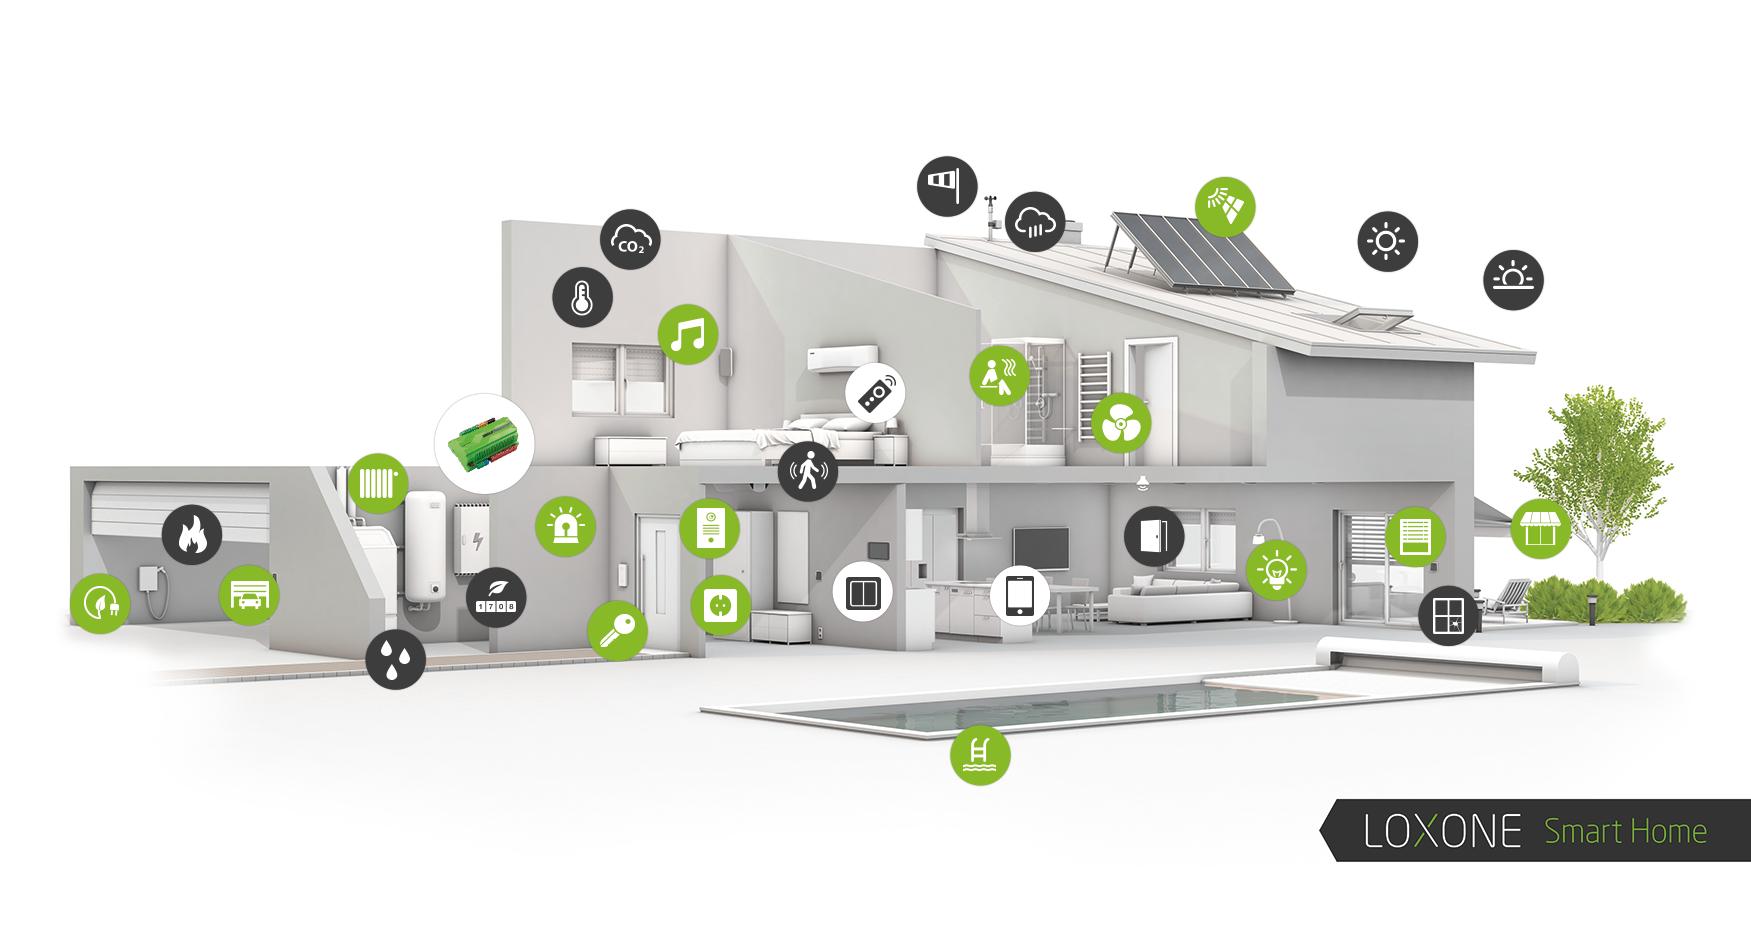 Smart Home Liefner Haustechnik Gmbh Elektro Sanitär Heizung